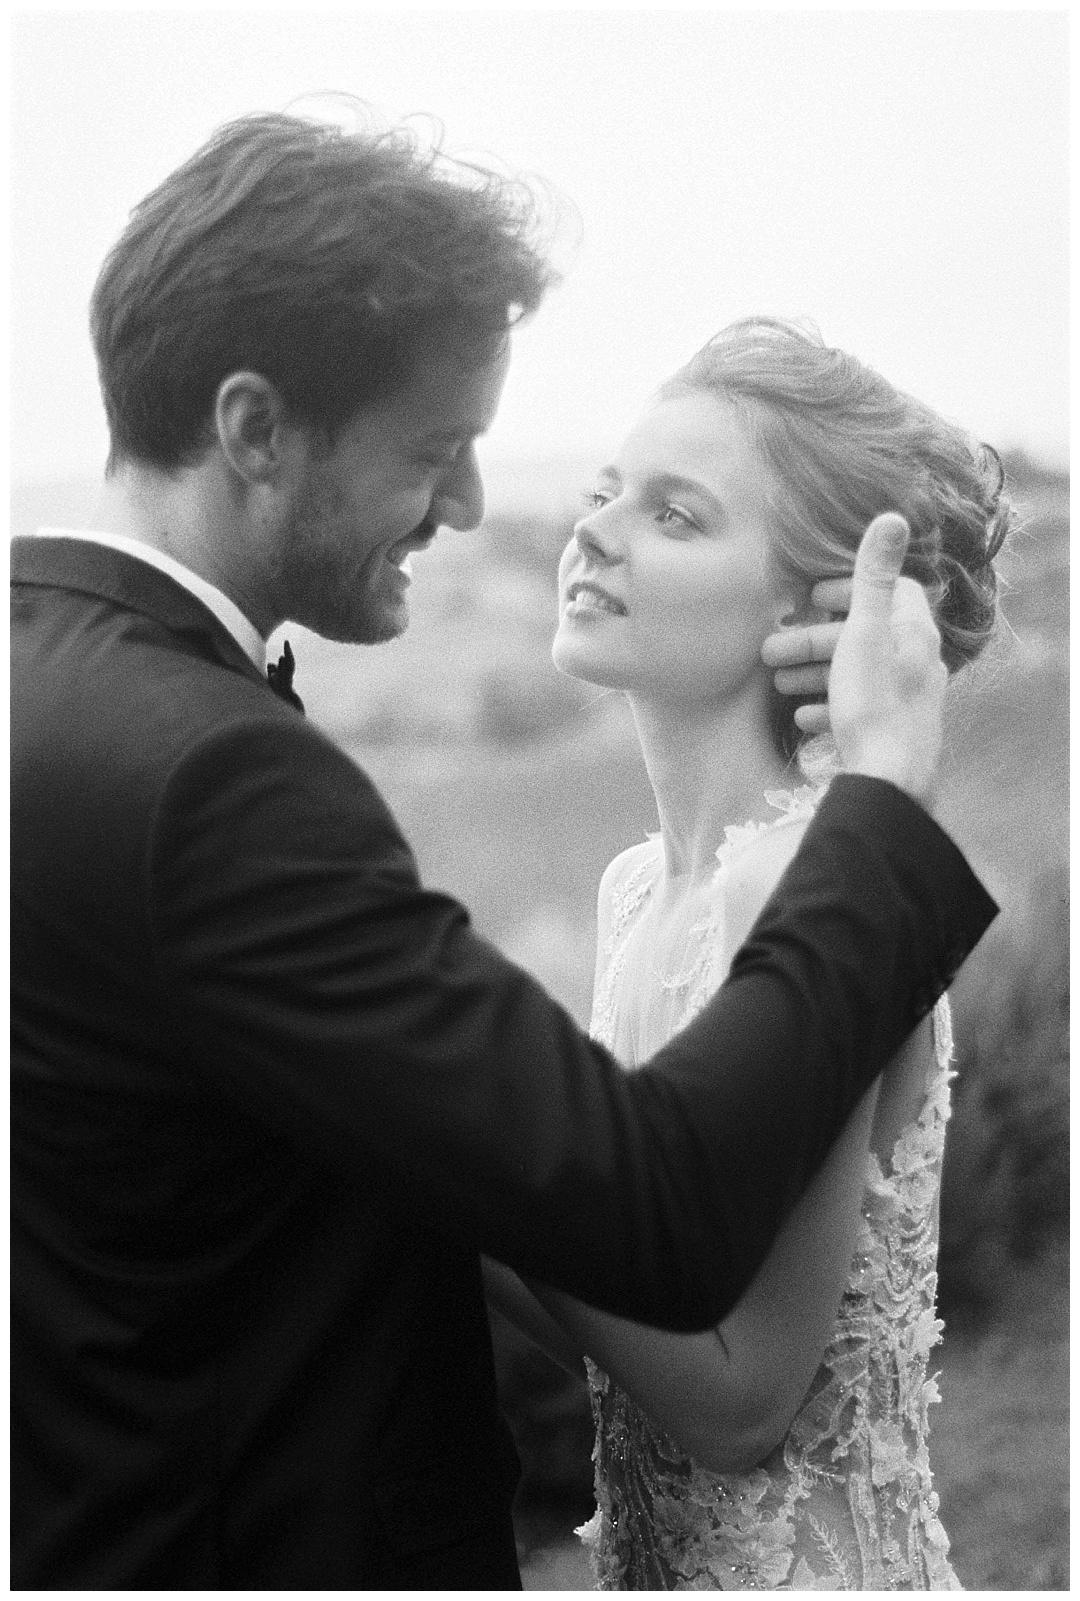 We_Can _Be_Heroes_alternative_wedding_photographer_Tuscany_wedding_film_0025